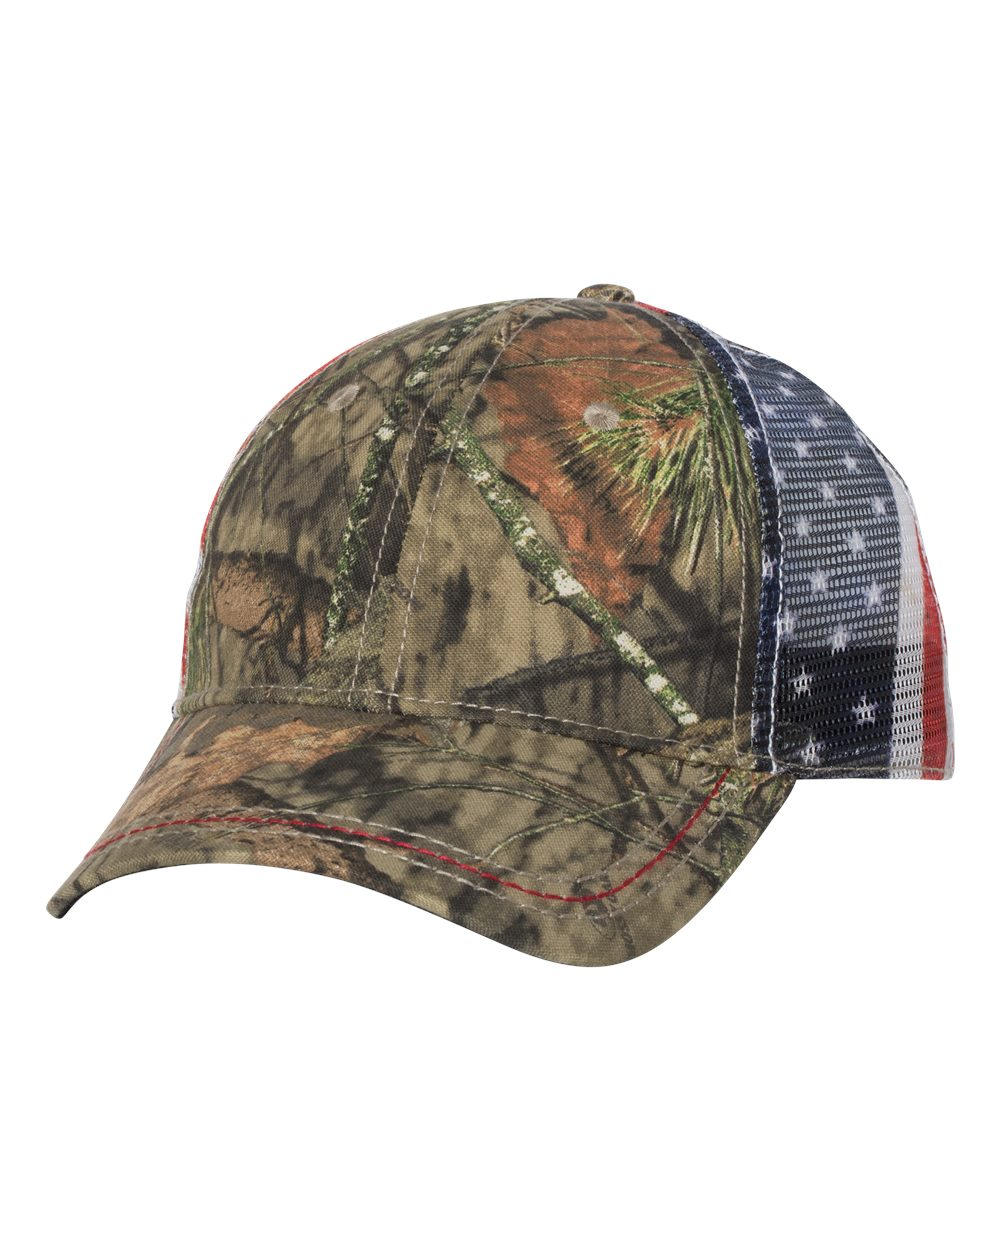 Outdoor Cap CWF400M - American Flag Mesh Back Camo Cap